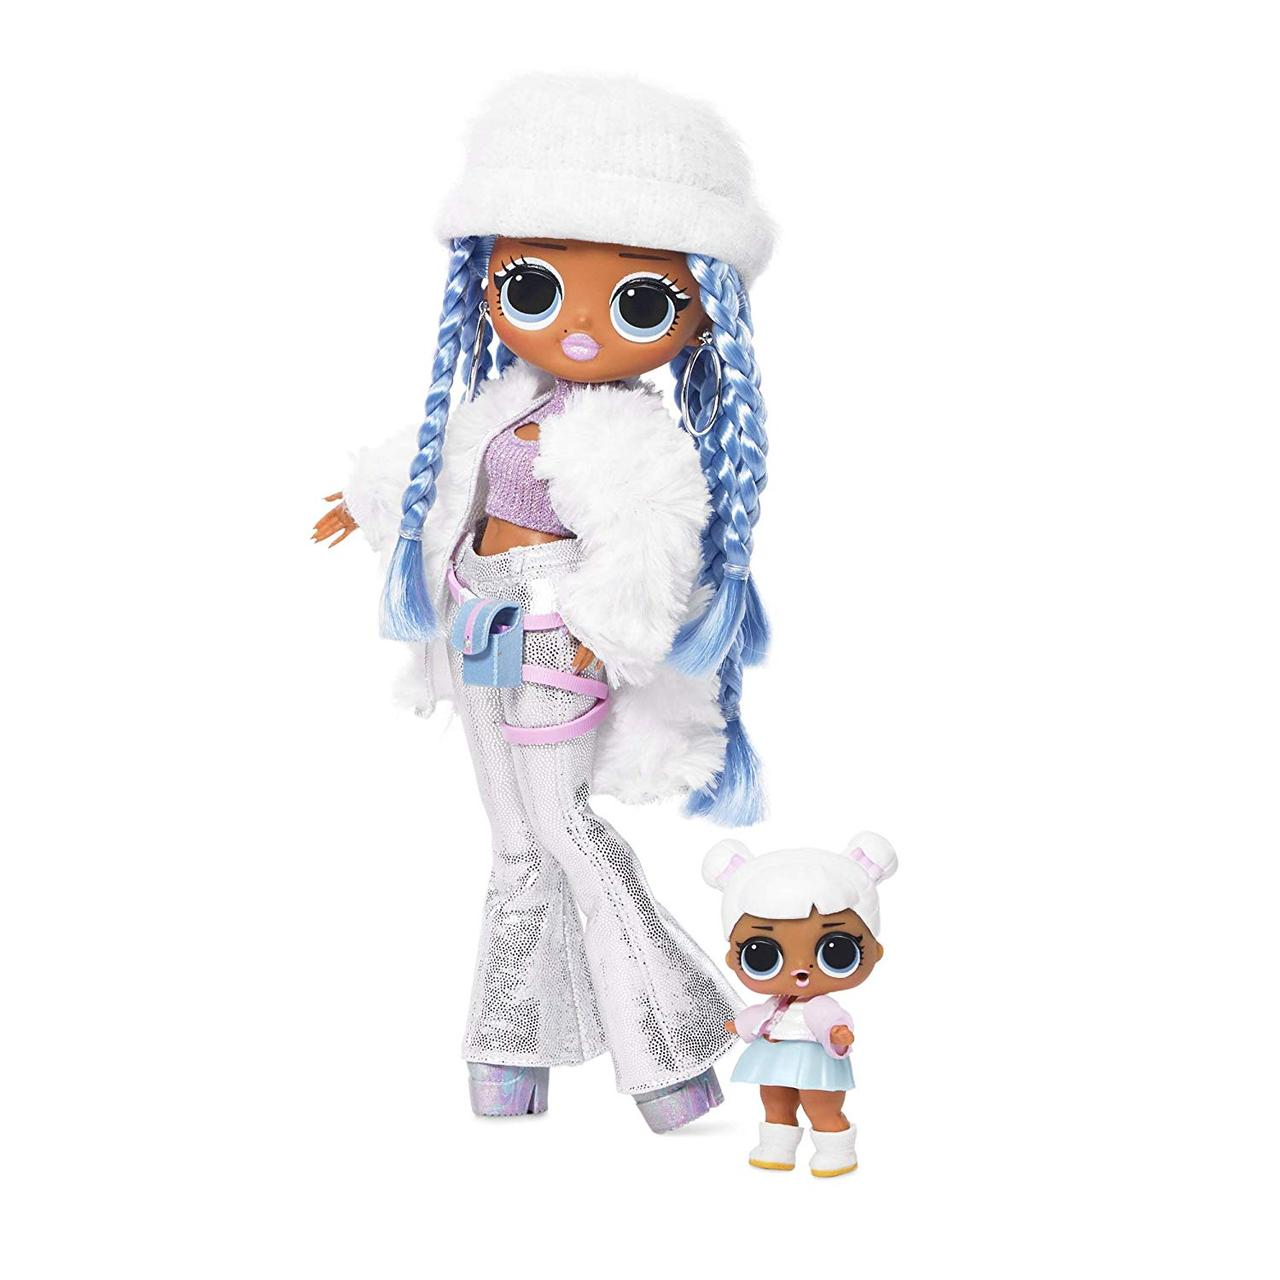 "Оригинал! L.O.L. SURPRISE! серии ""O.M.G."" - Winter Disco Снежный ангел"